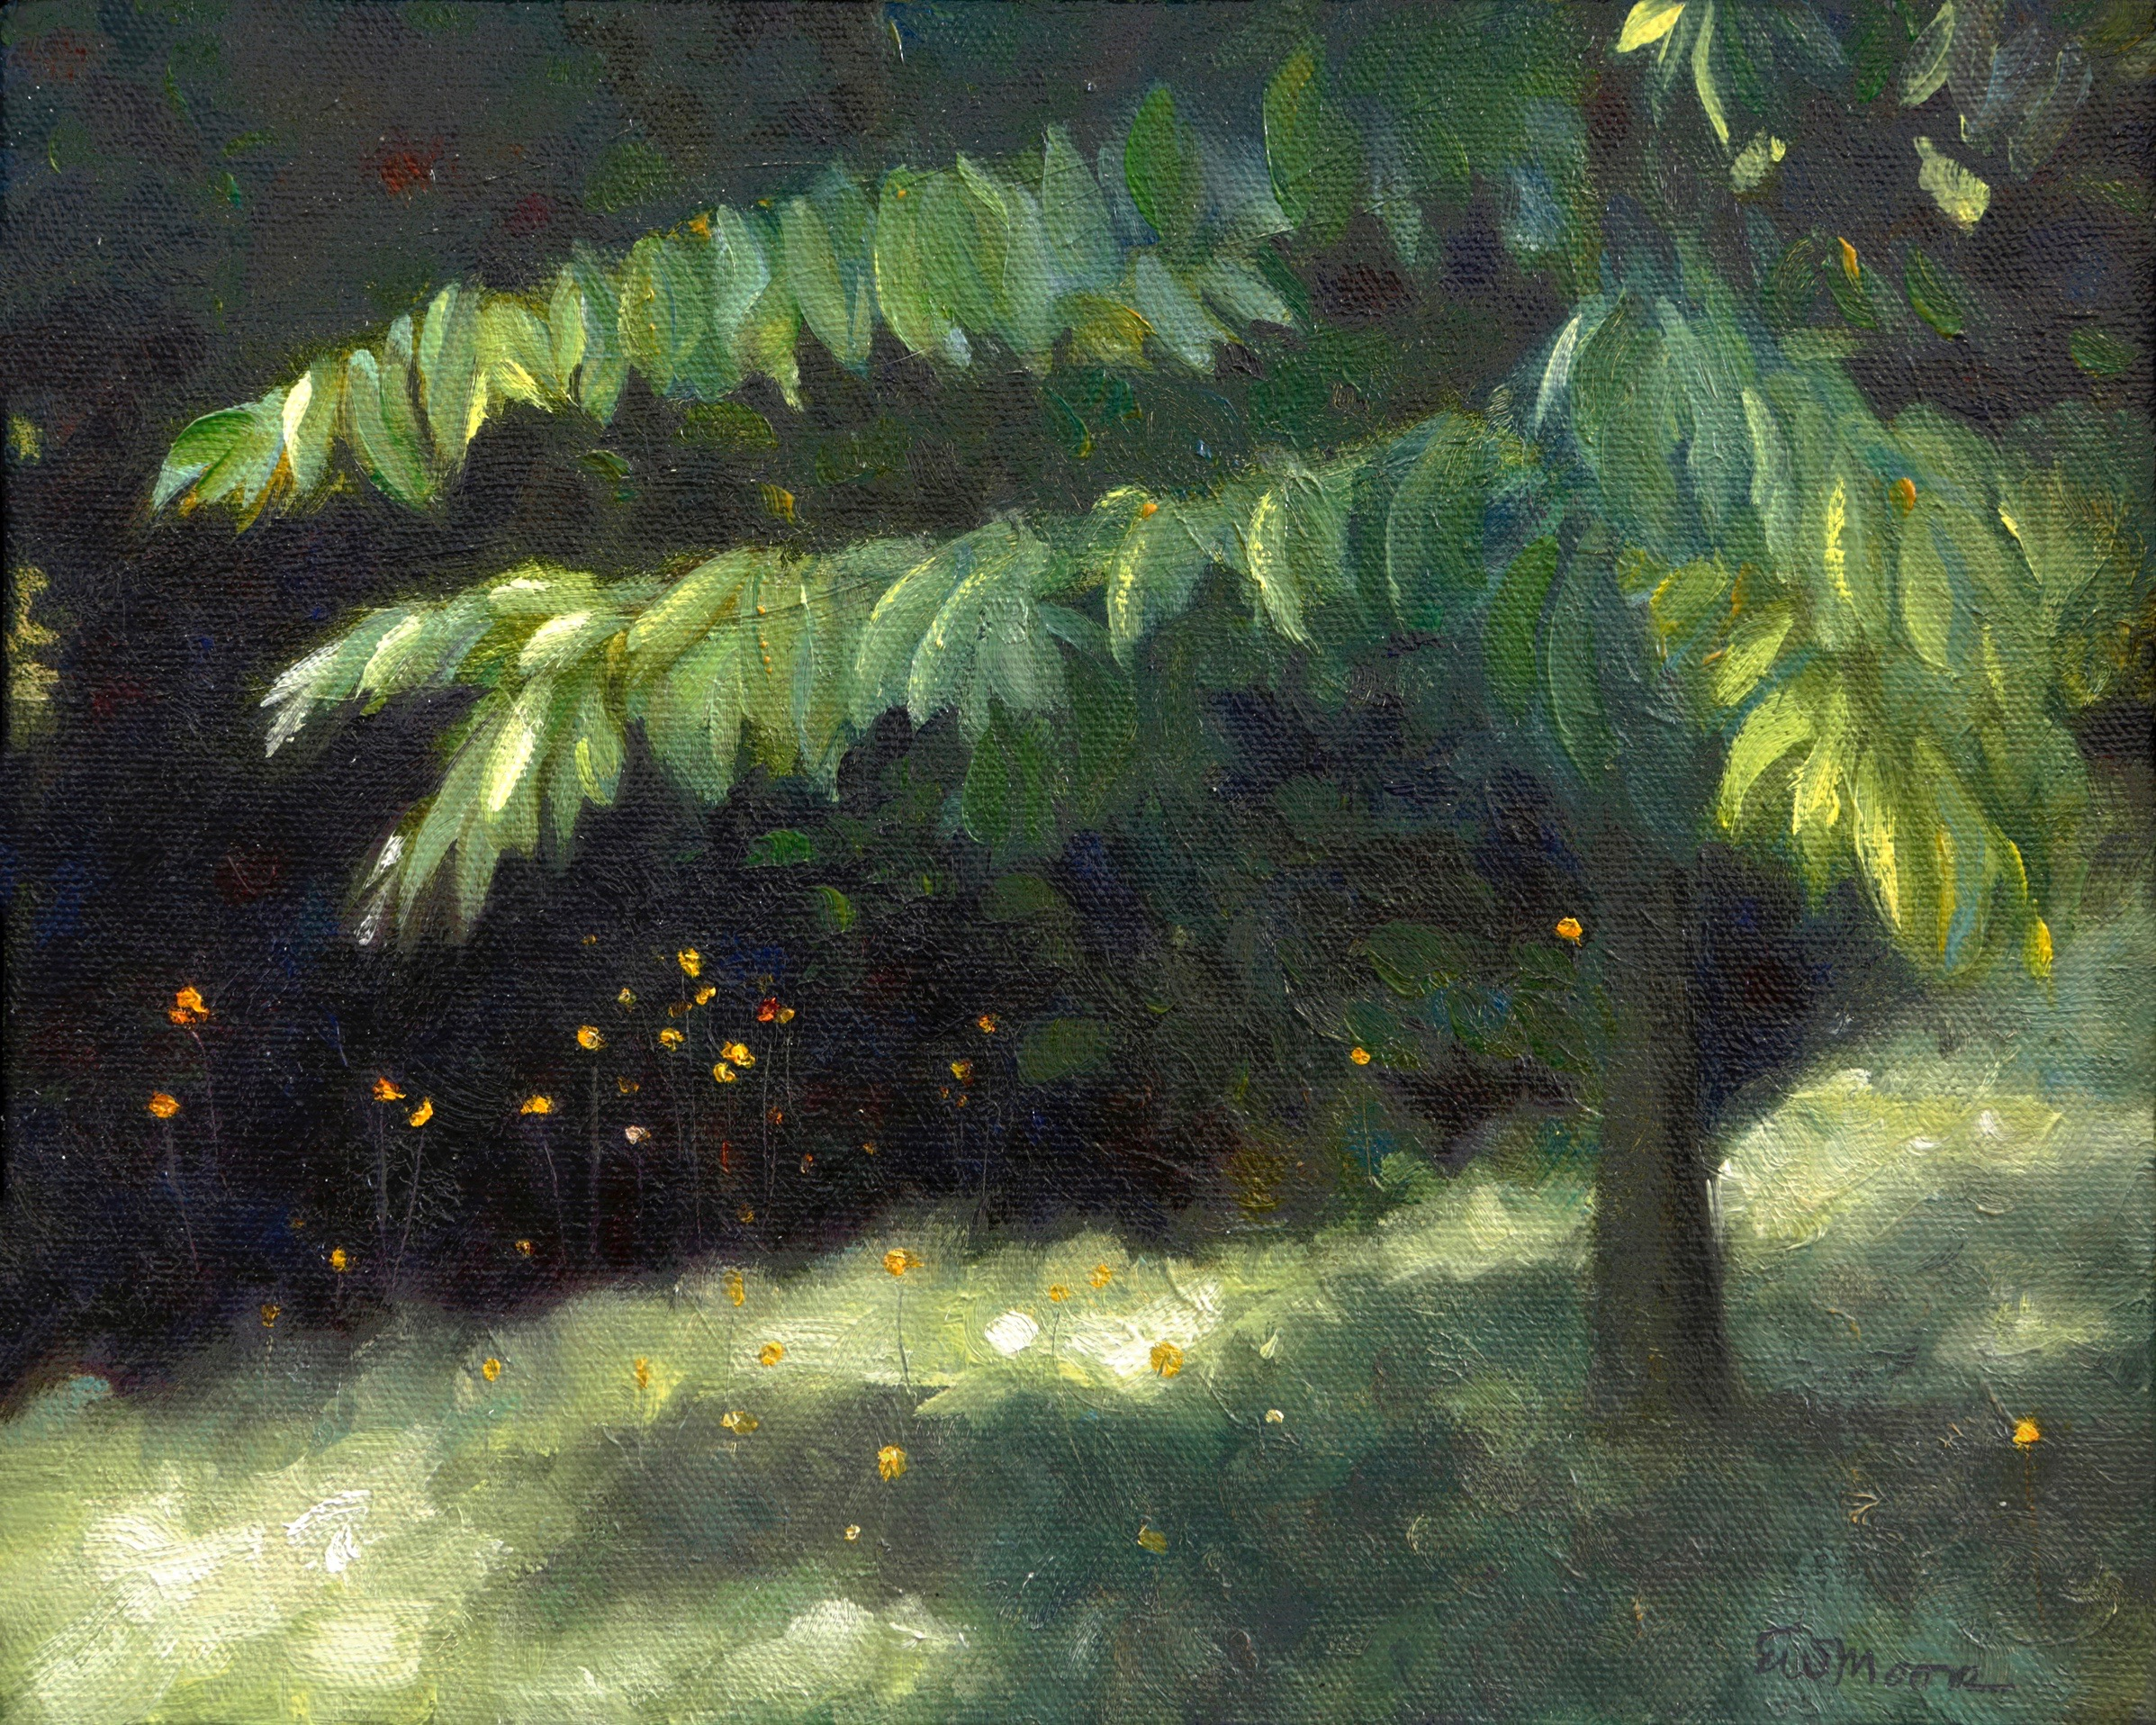 Hawkweed under the Chestnut Tree